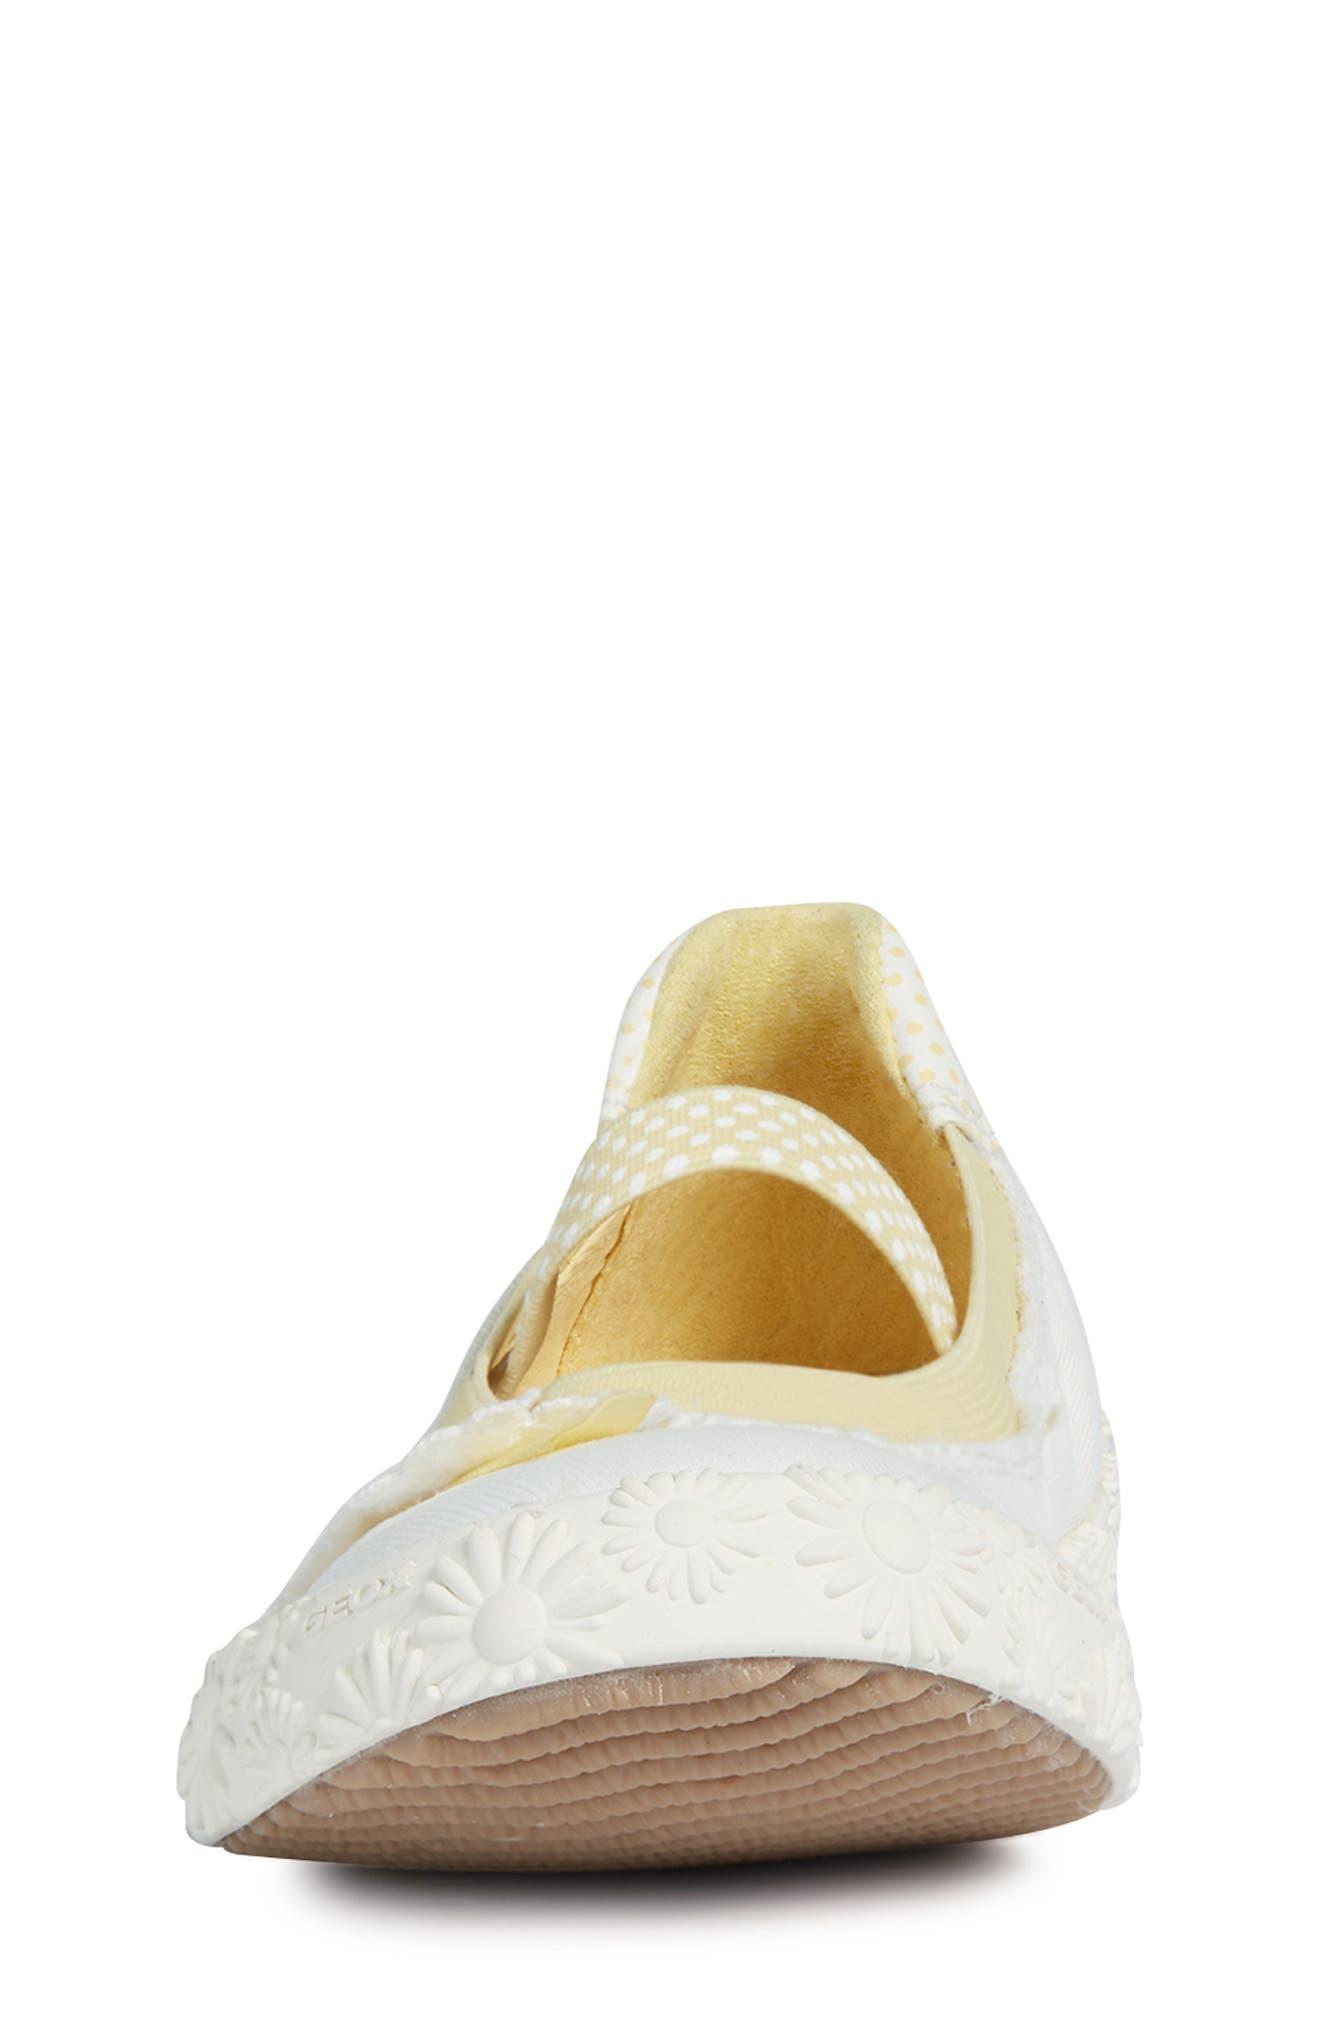 GEOX, Kilwi Daisy Mary Jane Sneaker, Alternate thumbnail 4, color, WHITE